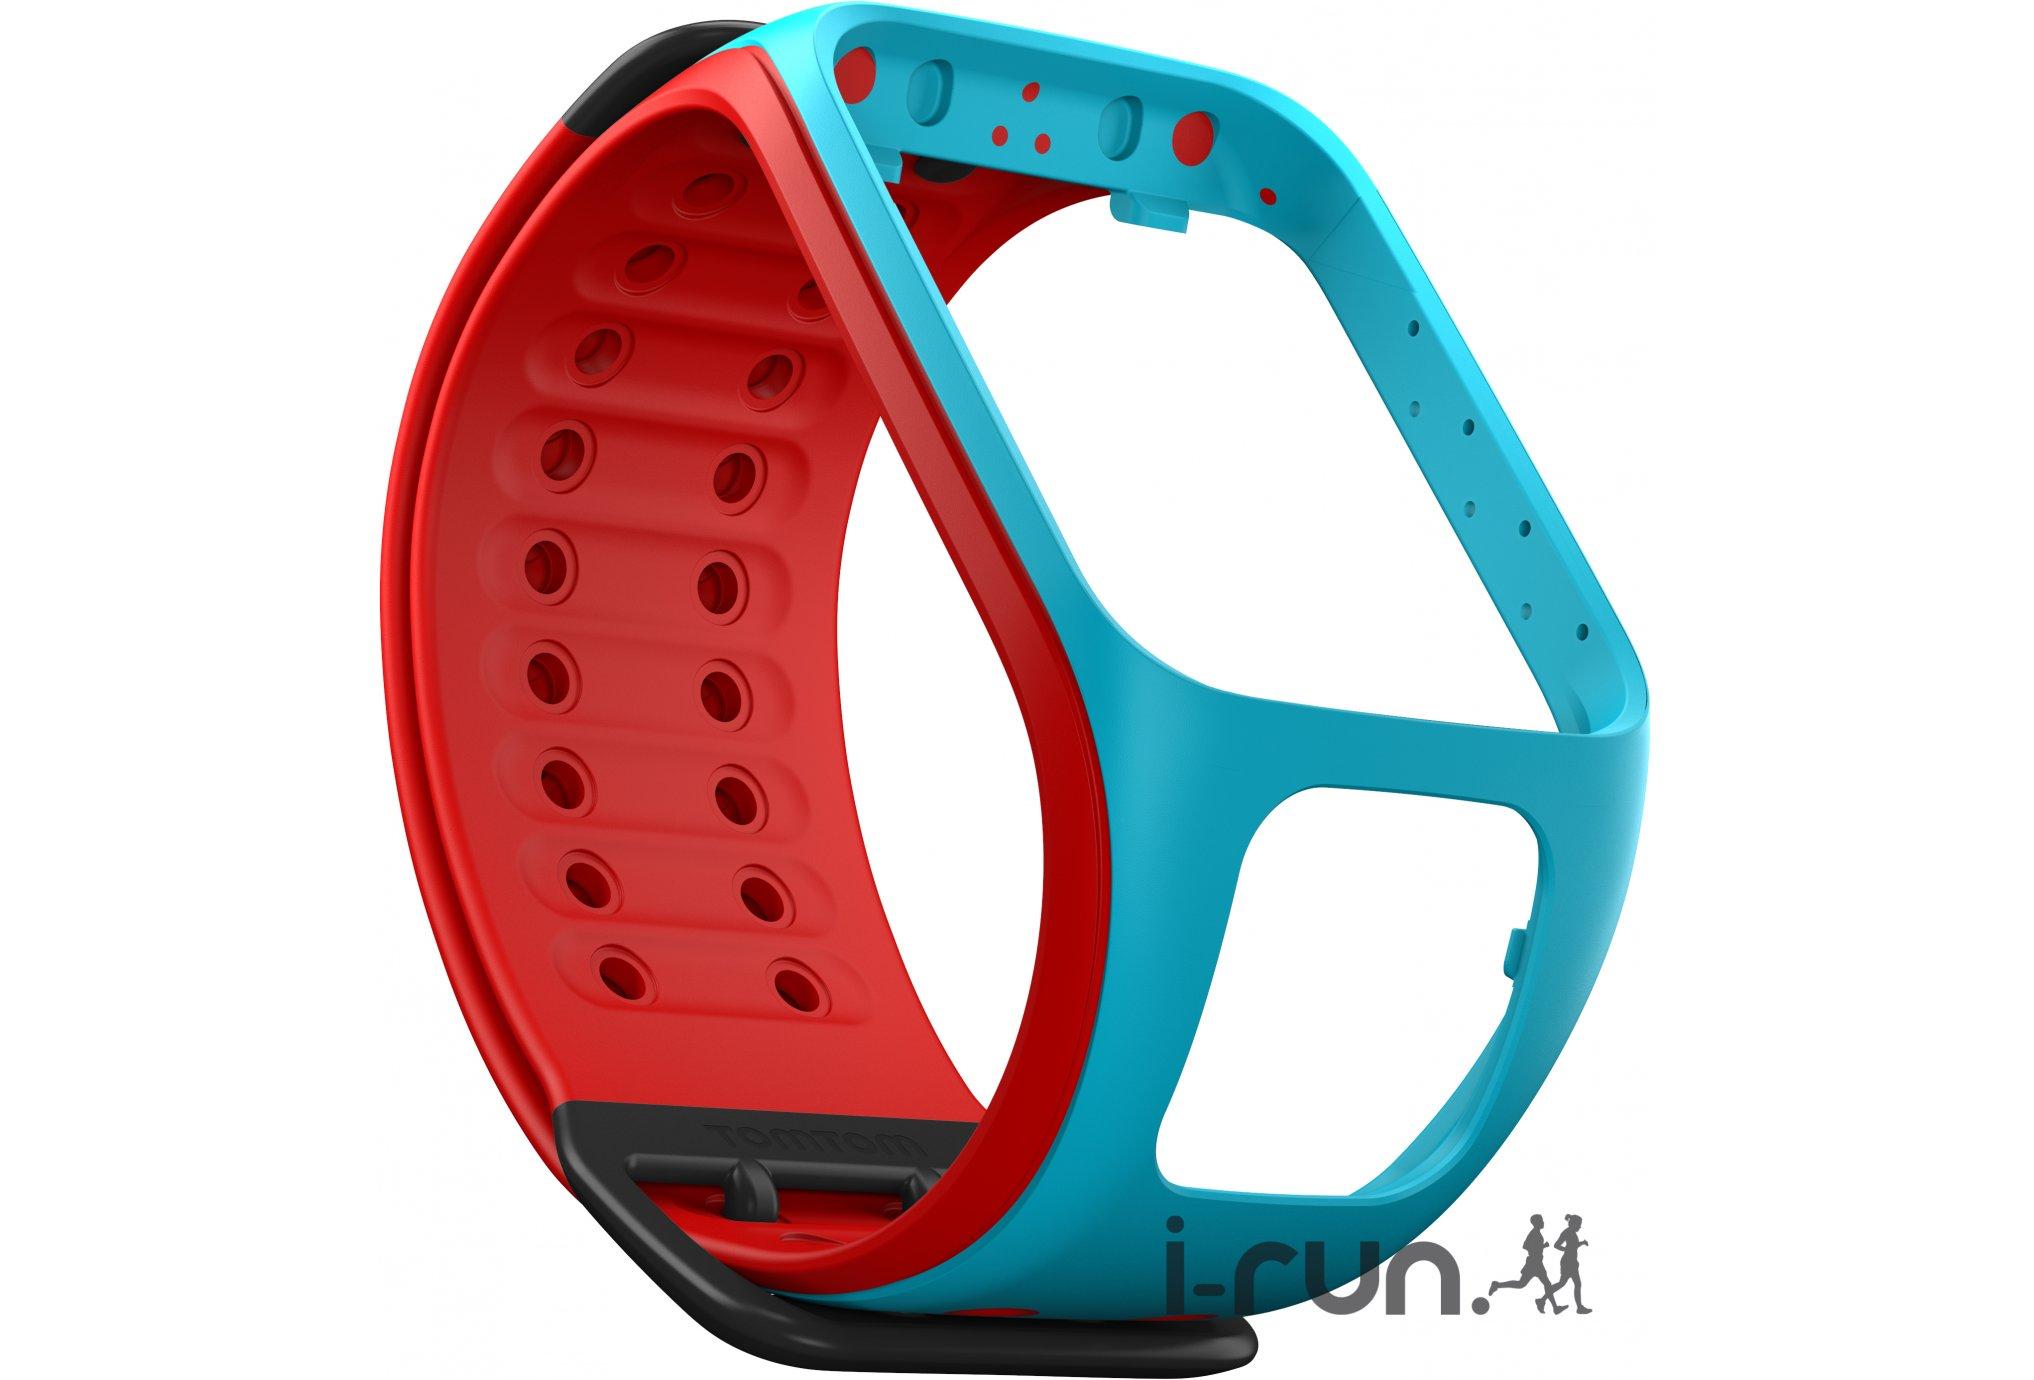 Tomtom Bracelet montre runner - large accessoires montres/ bracelets